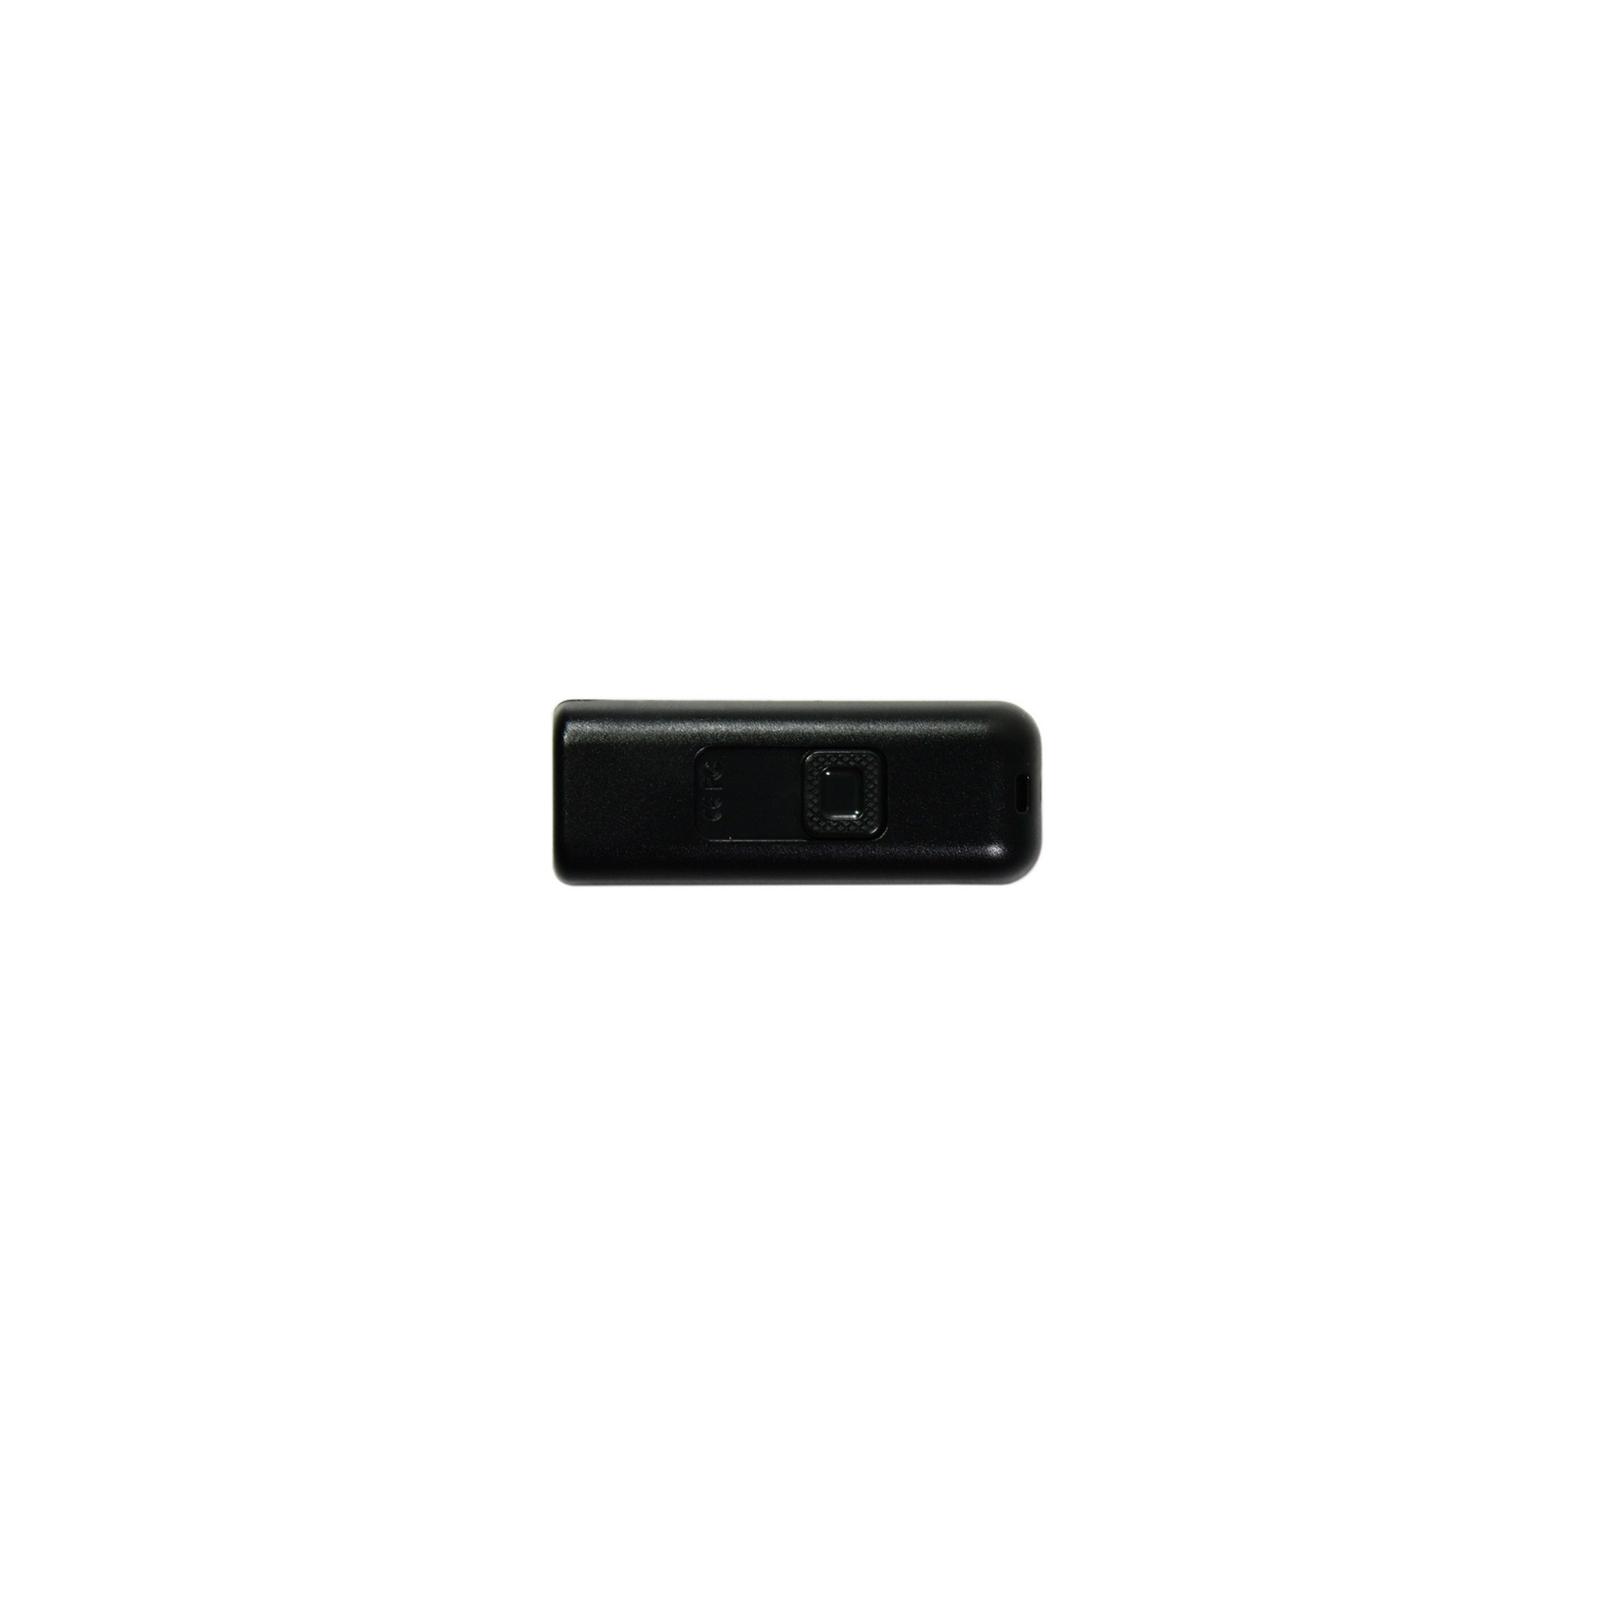 USB флеш накопитель 32GB AH328 Silver RP USB2.0 Apacer (AP32GAH328S-1) изображение 2